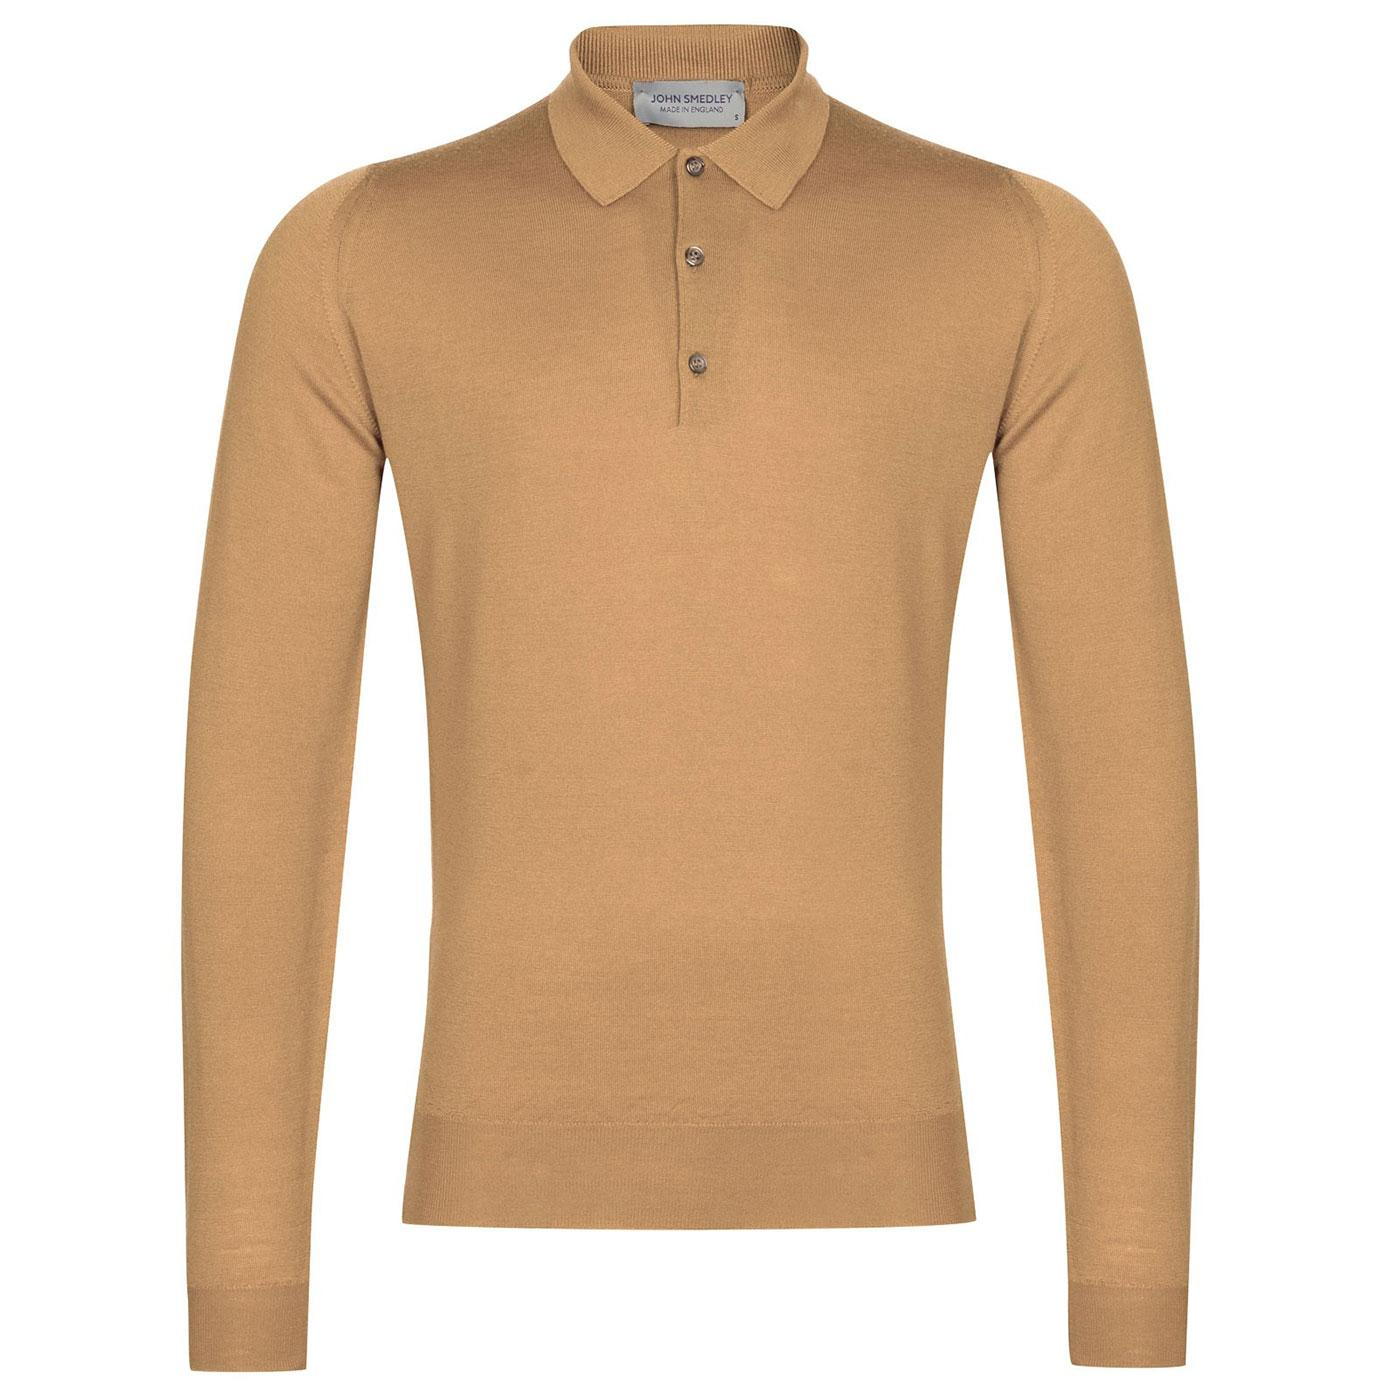 Belper JOHN SMEDLEY 60's Knitted Mod Polo Shirt LC